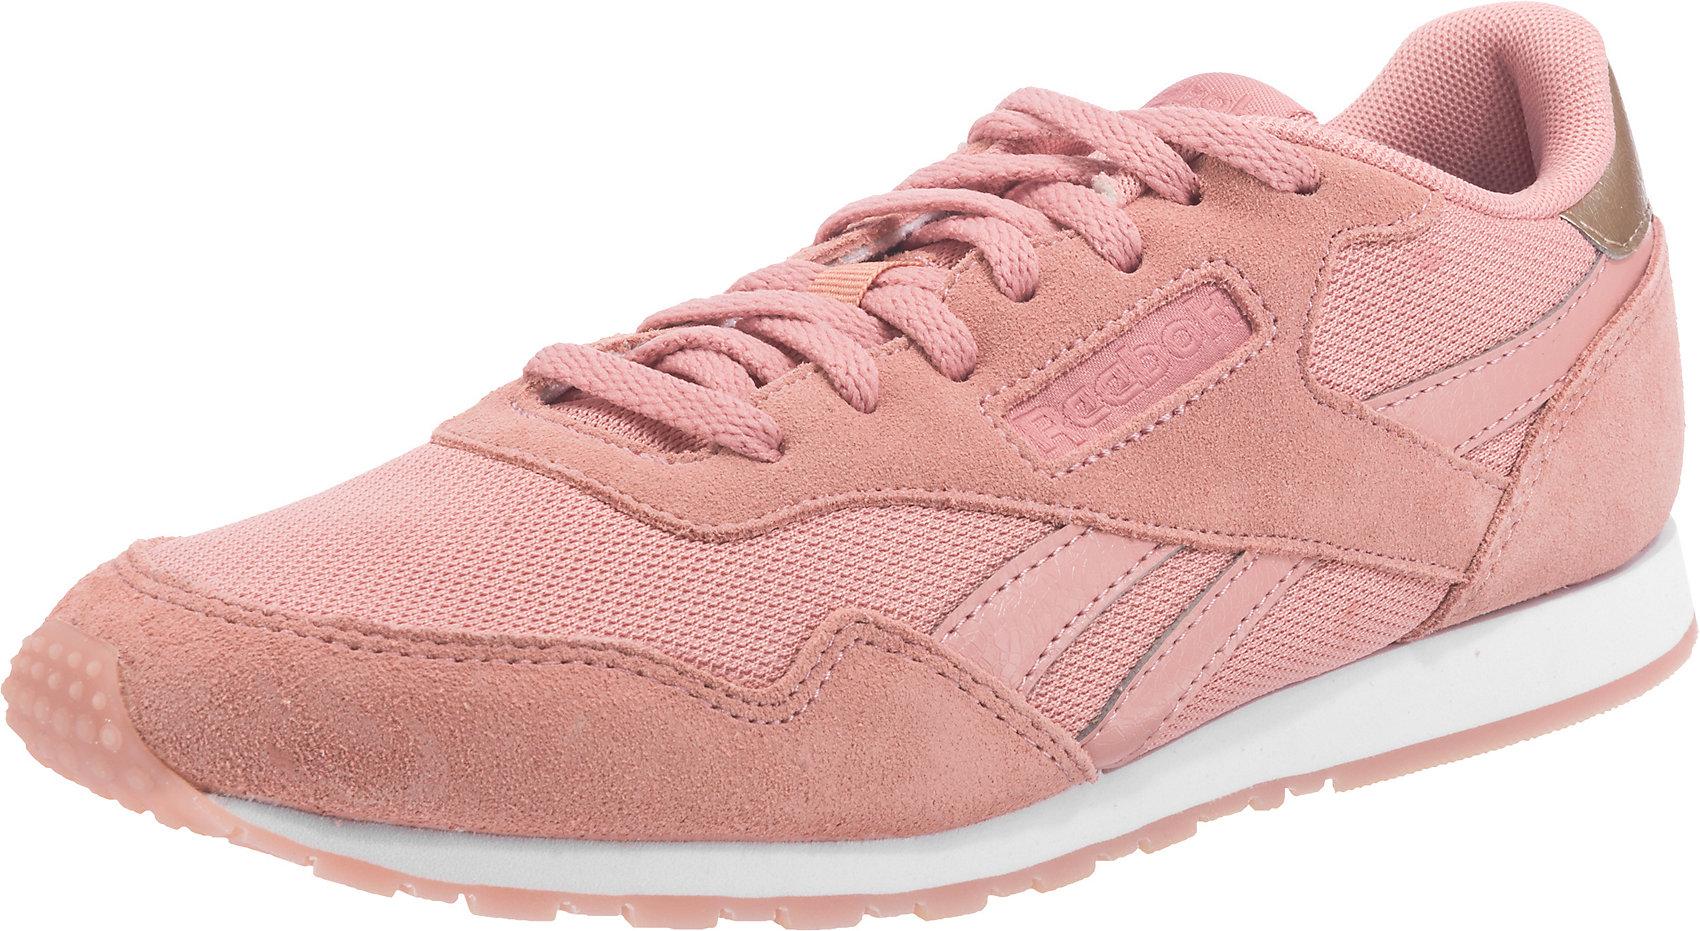 Details zu Neu REEBOK ROYAL ULTRA SL Sneakers Low 7408242 für Damen rosa